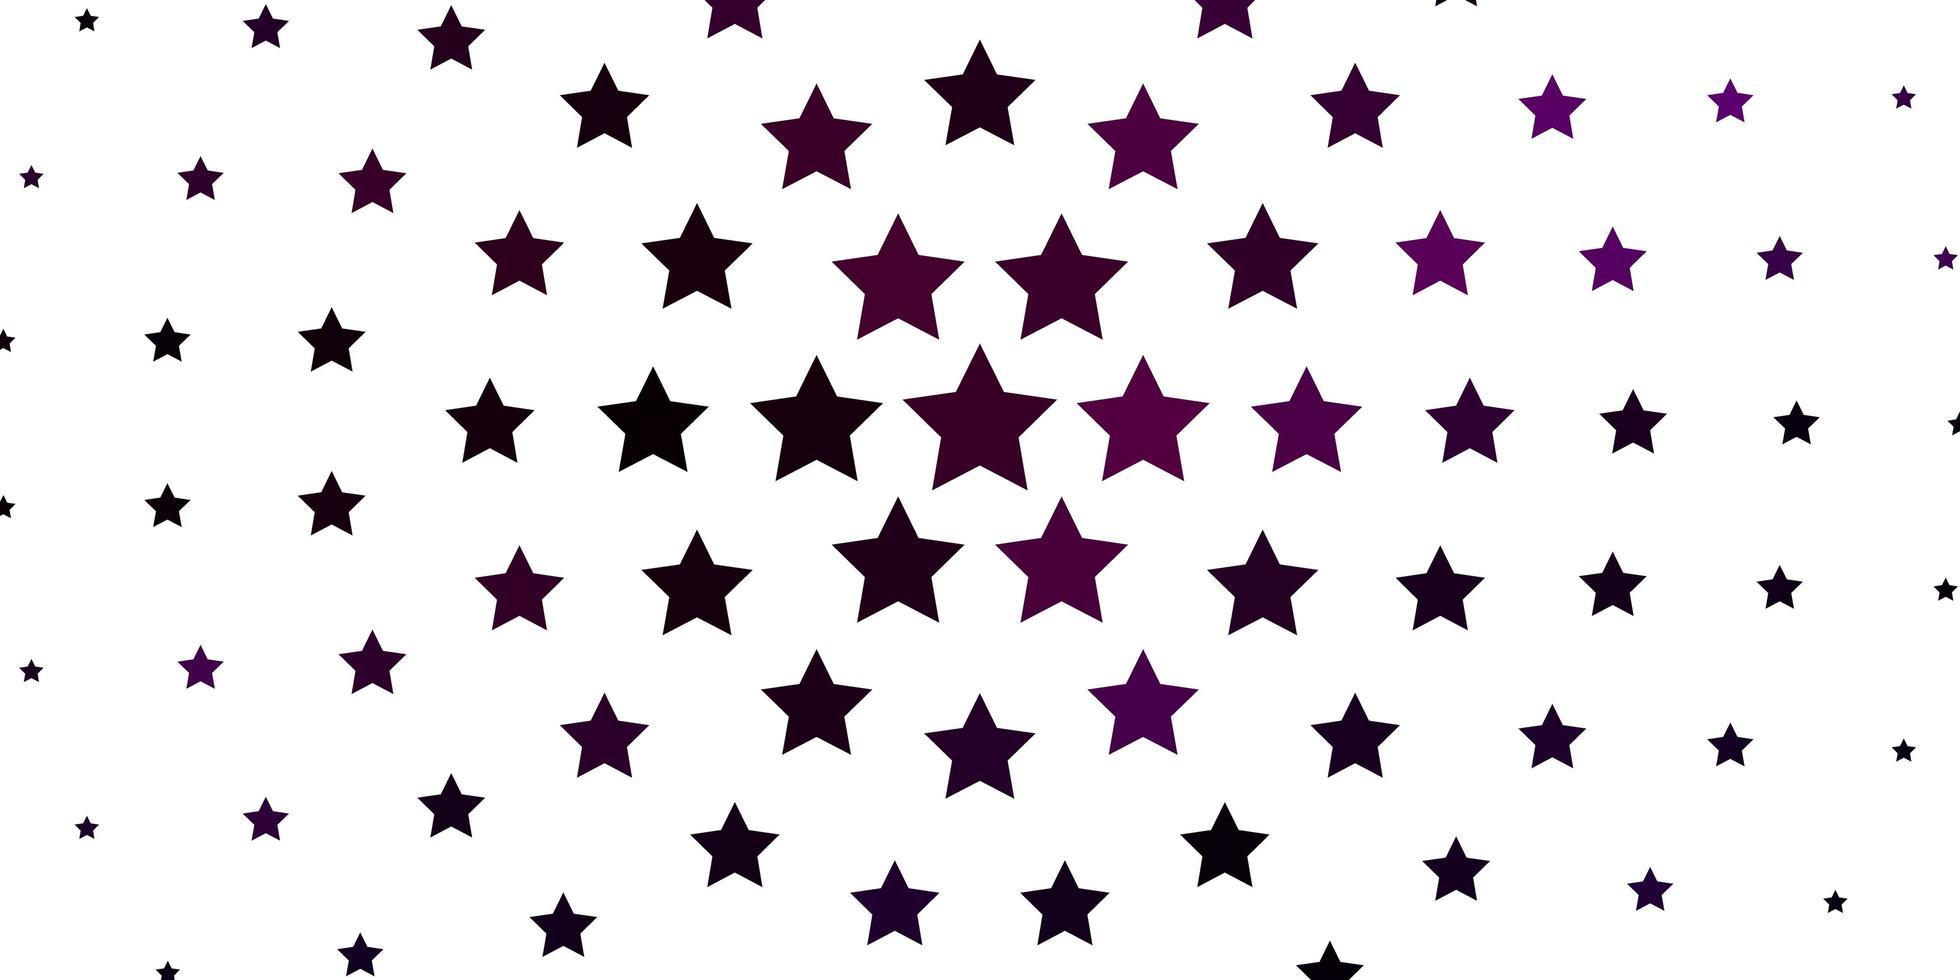 patrón oscuro con estrellas abstractas. vector